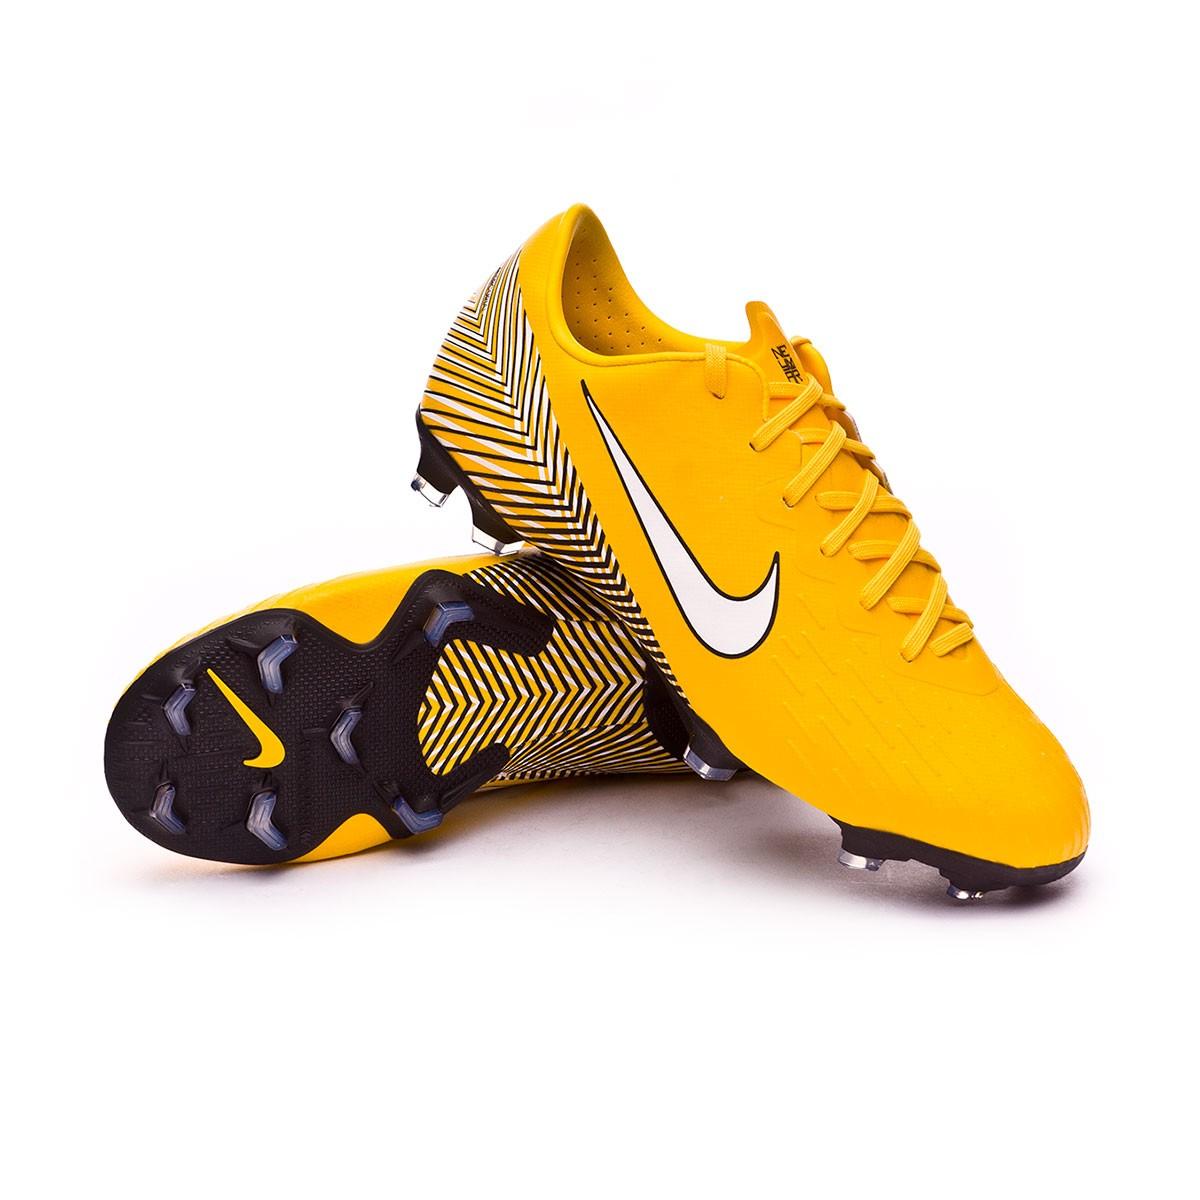 f1456335fc118 Bota de fútbol Nike Mercurial Vapor XII Elite FG Neymar Niño  Yellow-Black-Anthracite - Tienda de fútbol Fútbol Emotion